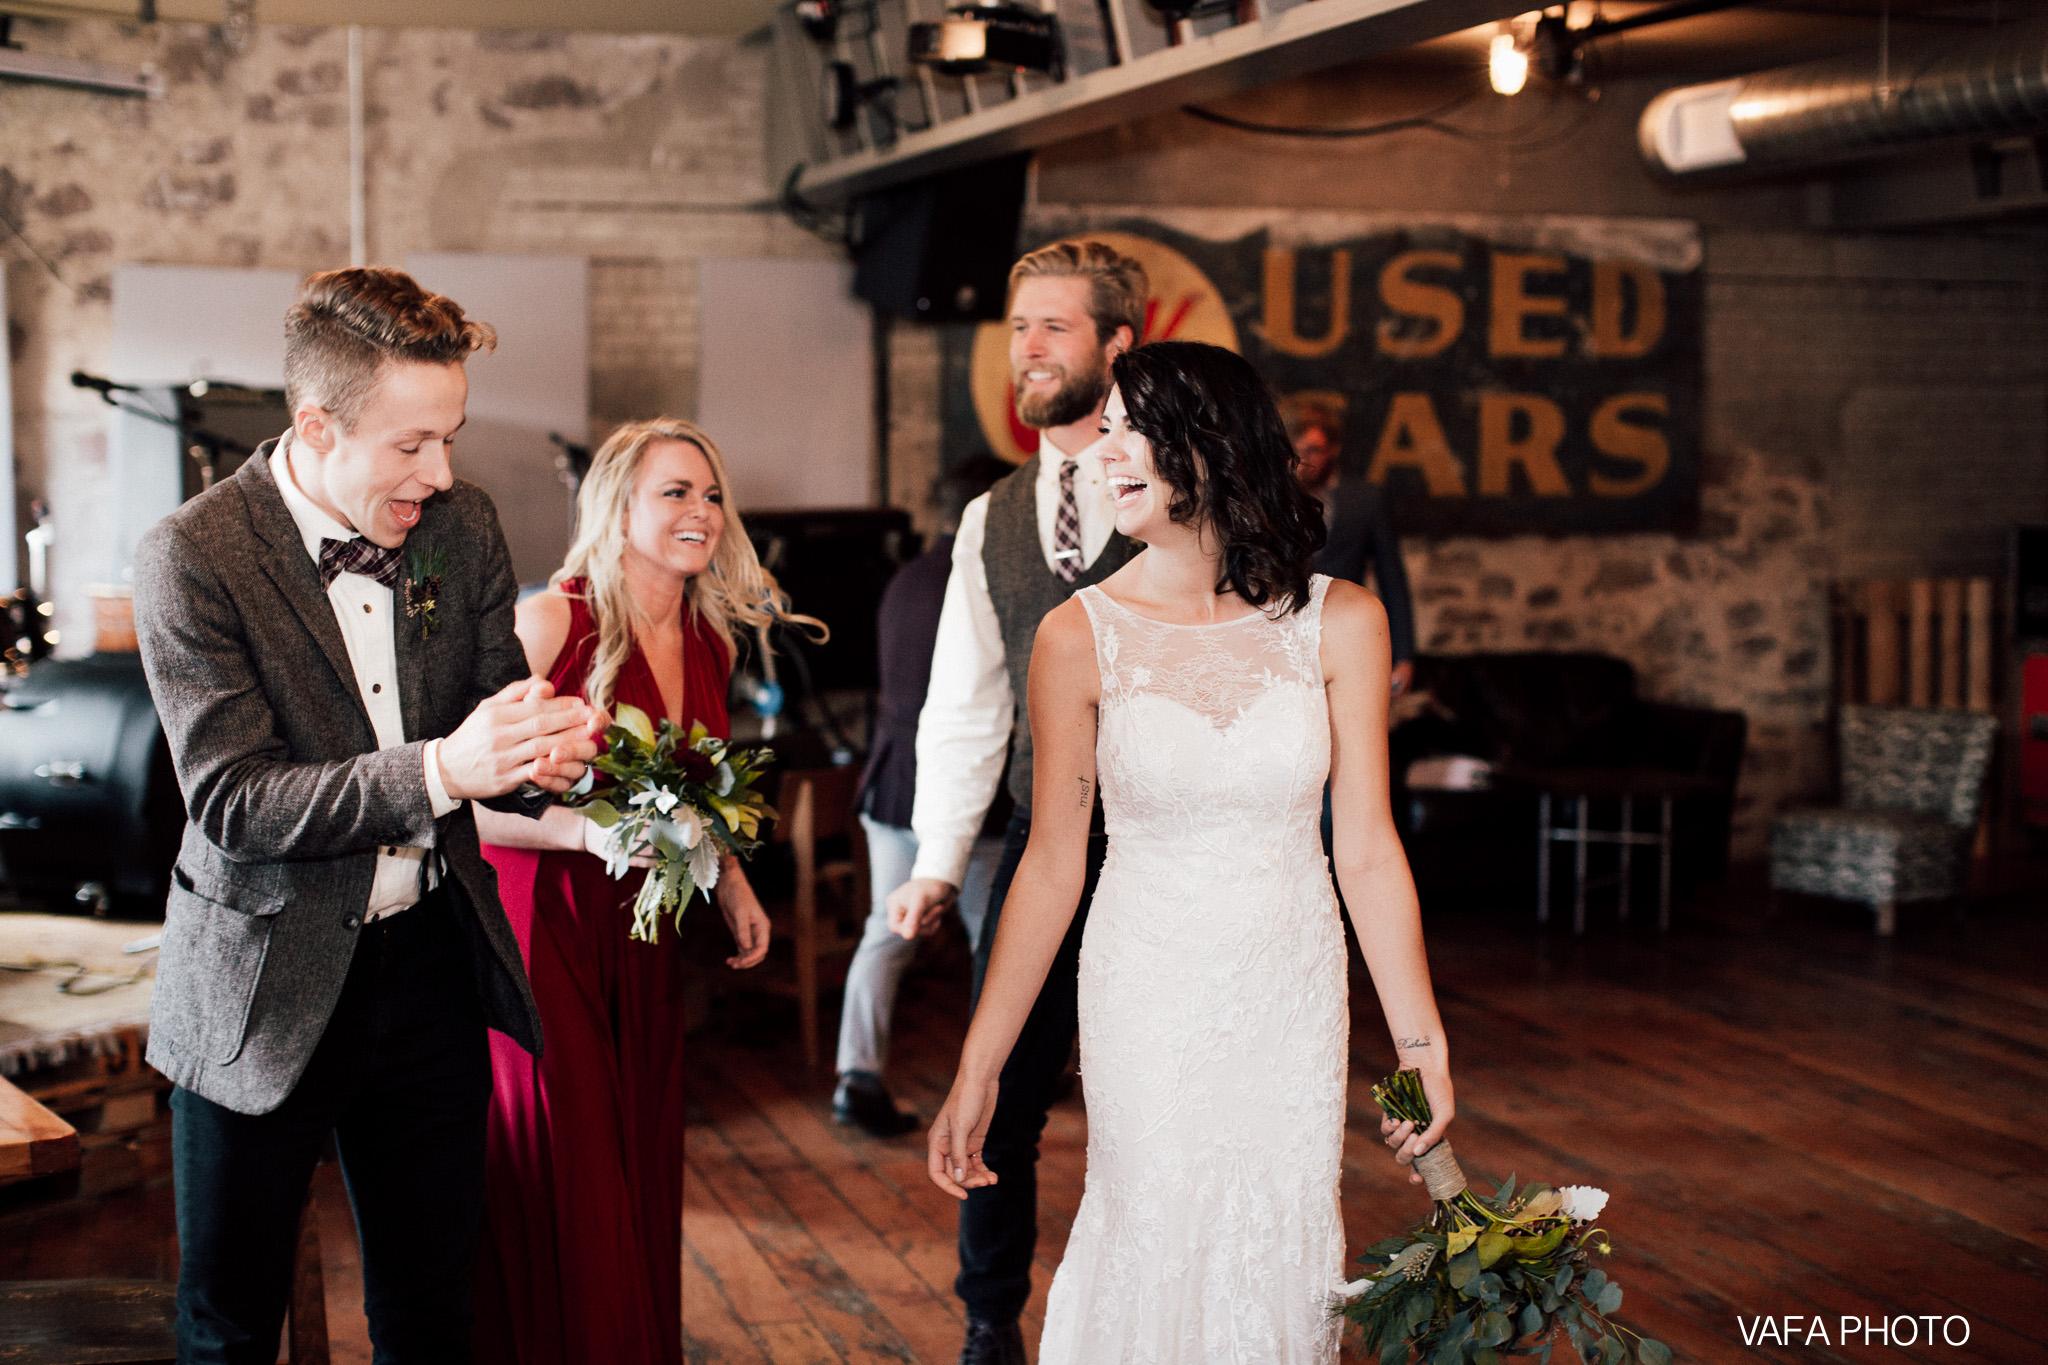 Hogback-Mountain-Wedding-Chelsea-Josh-Vafa-Photo-731.jpg